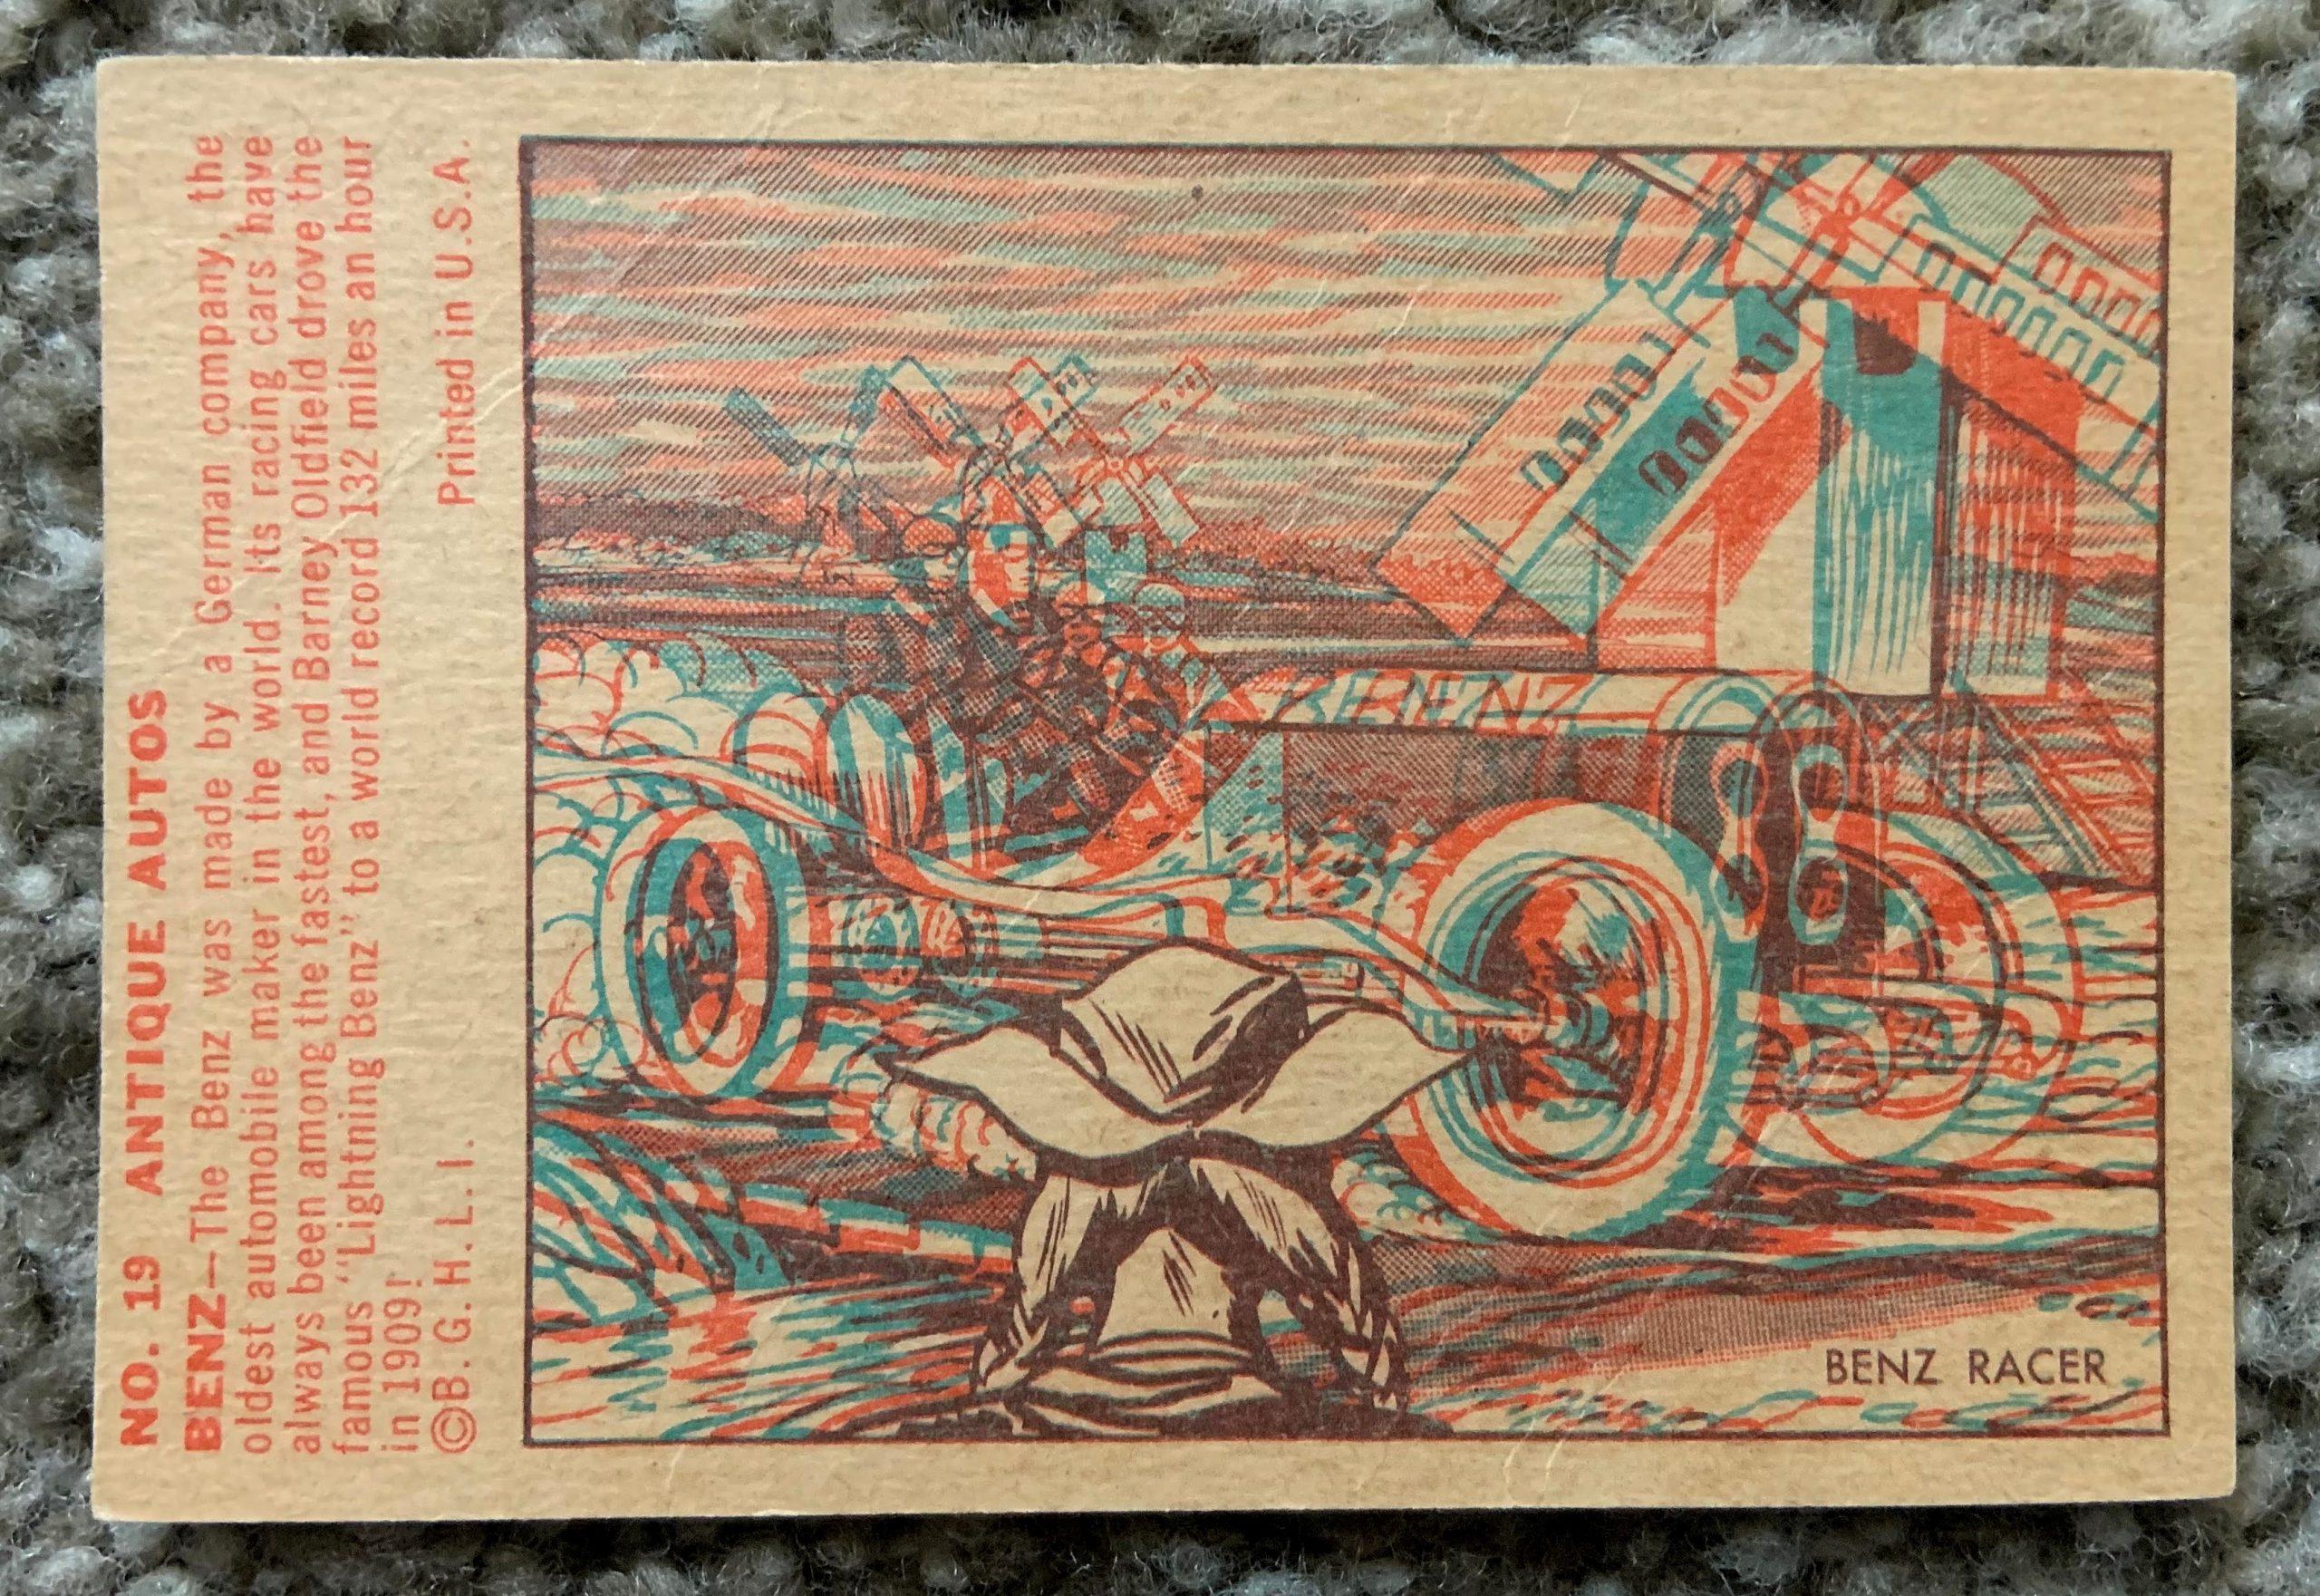 1953 Bowman Antique Autos - No. 19 Benz Racer back